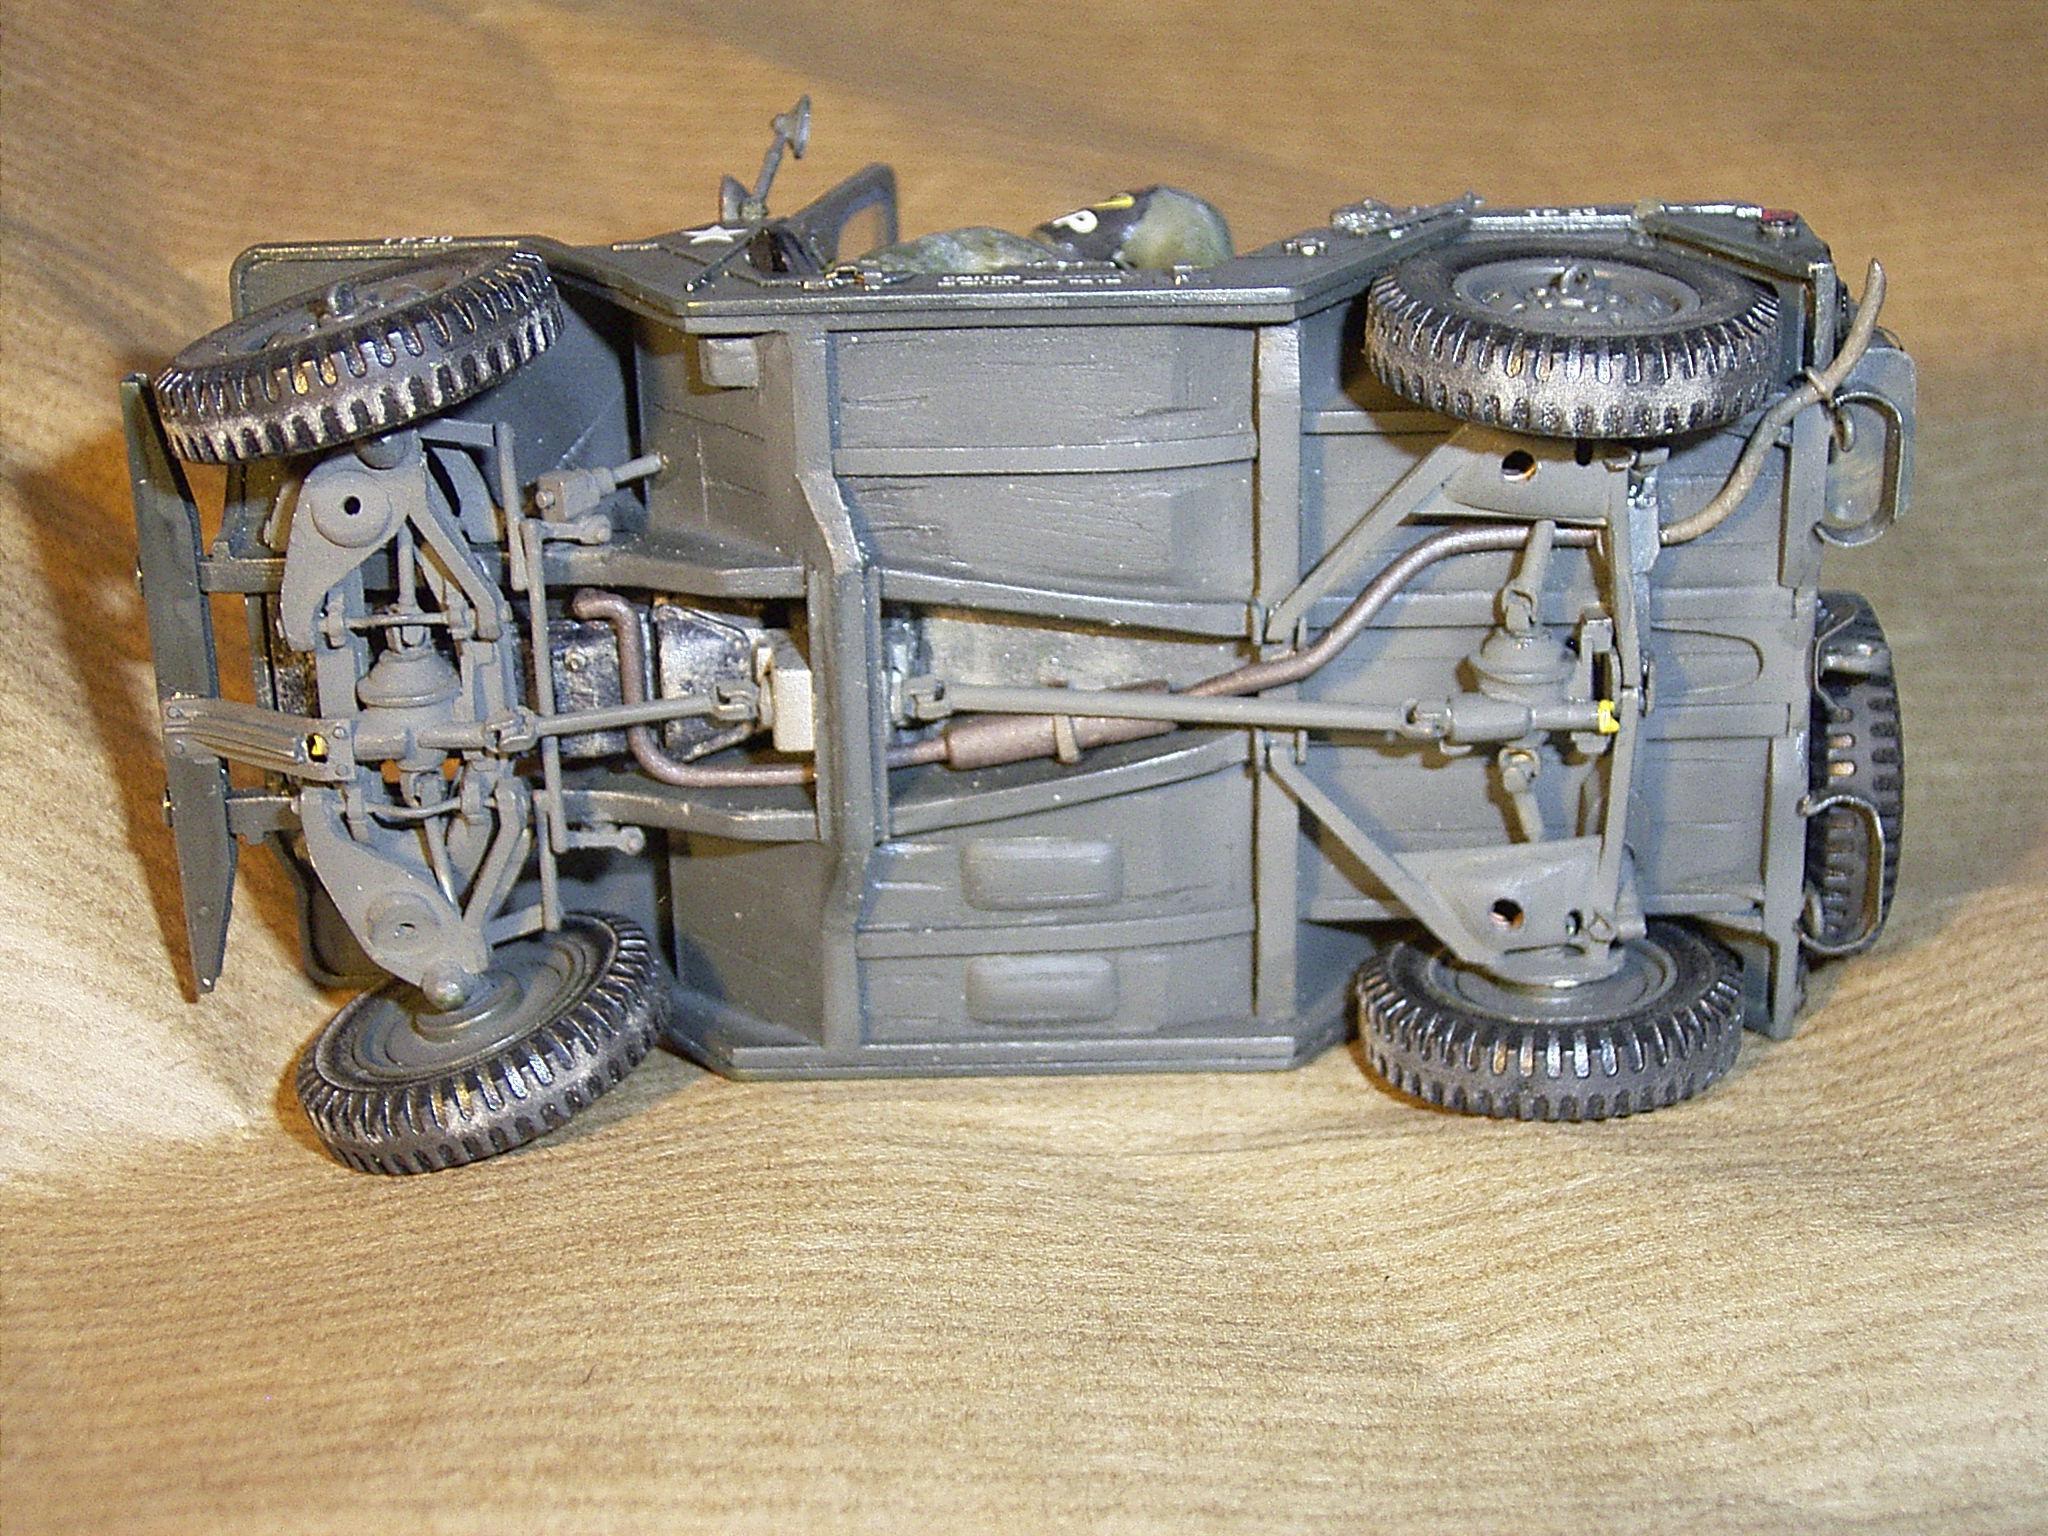 General Truck Body >> M151A1 MUTT